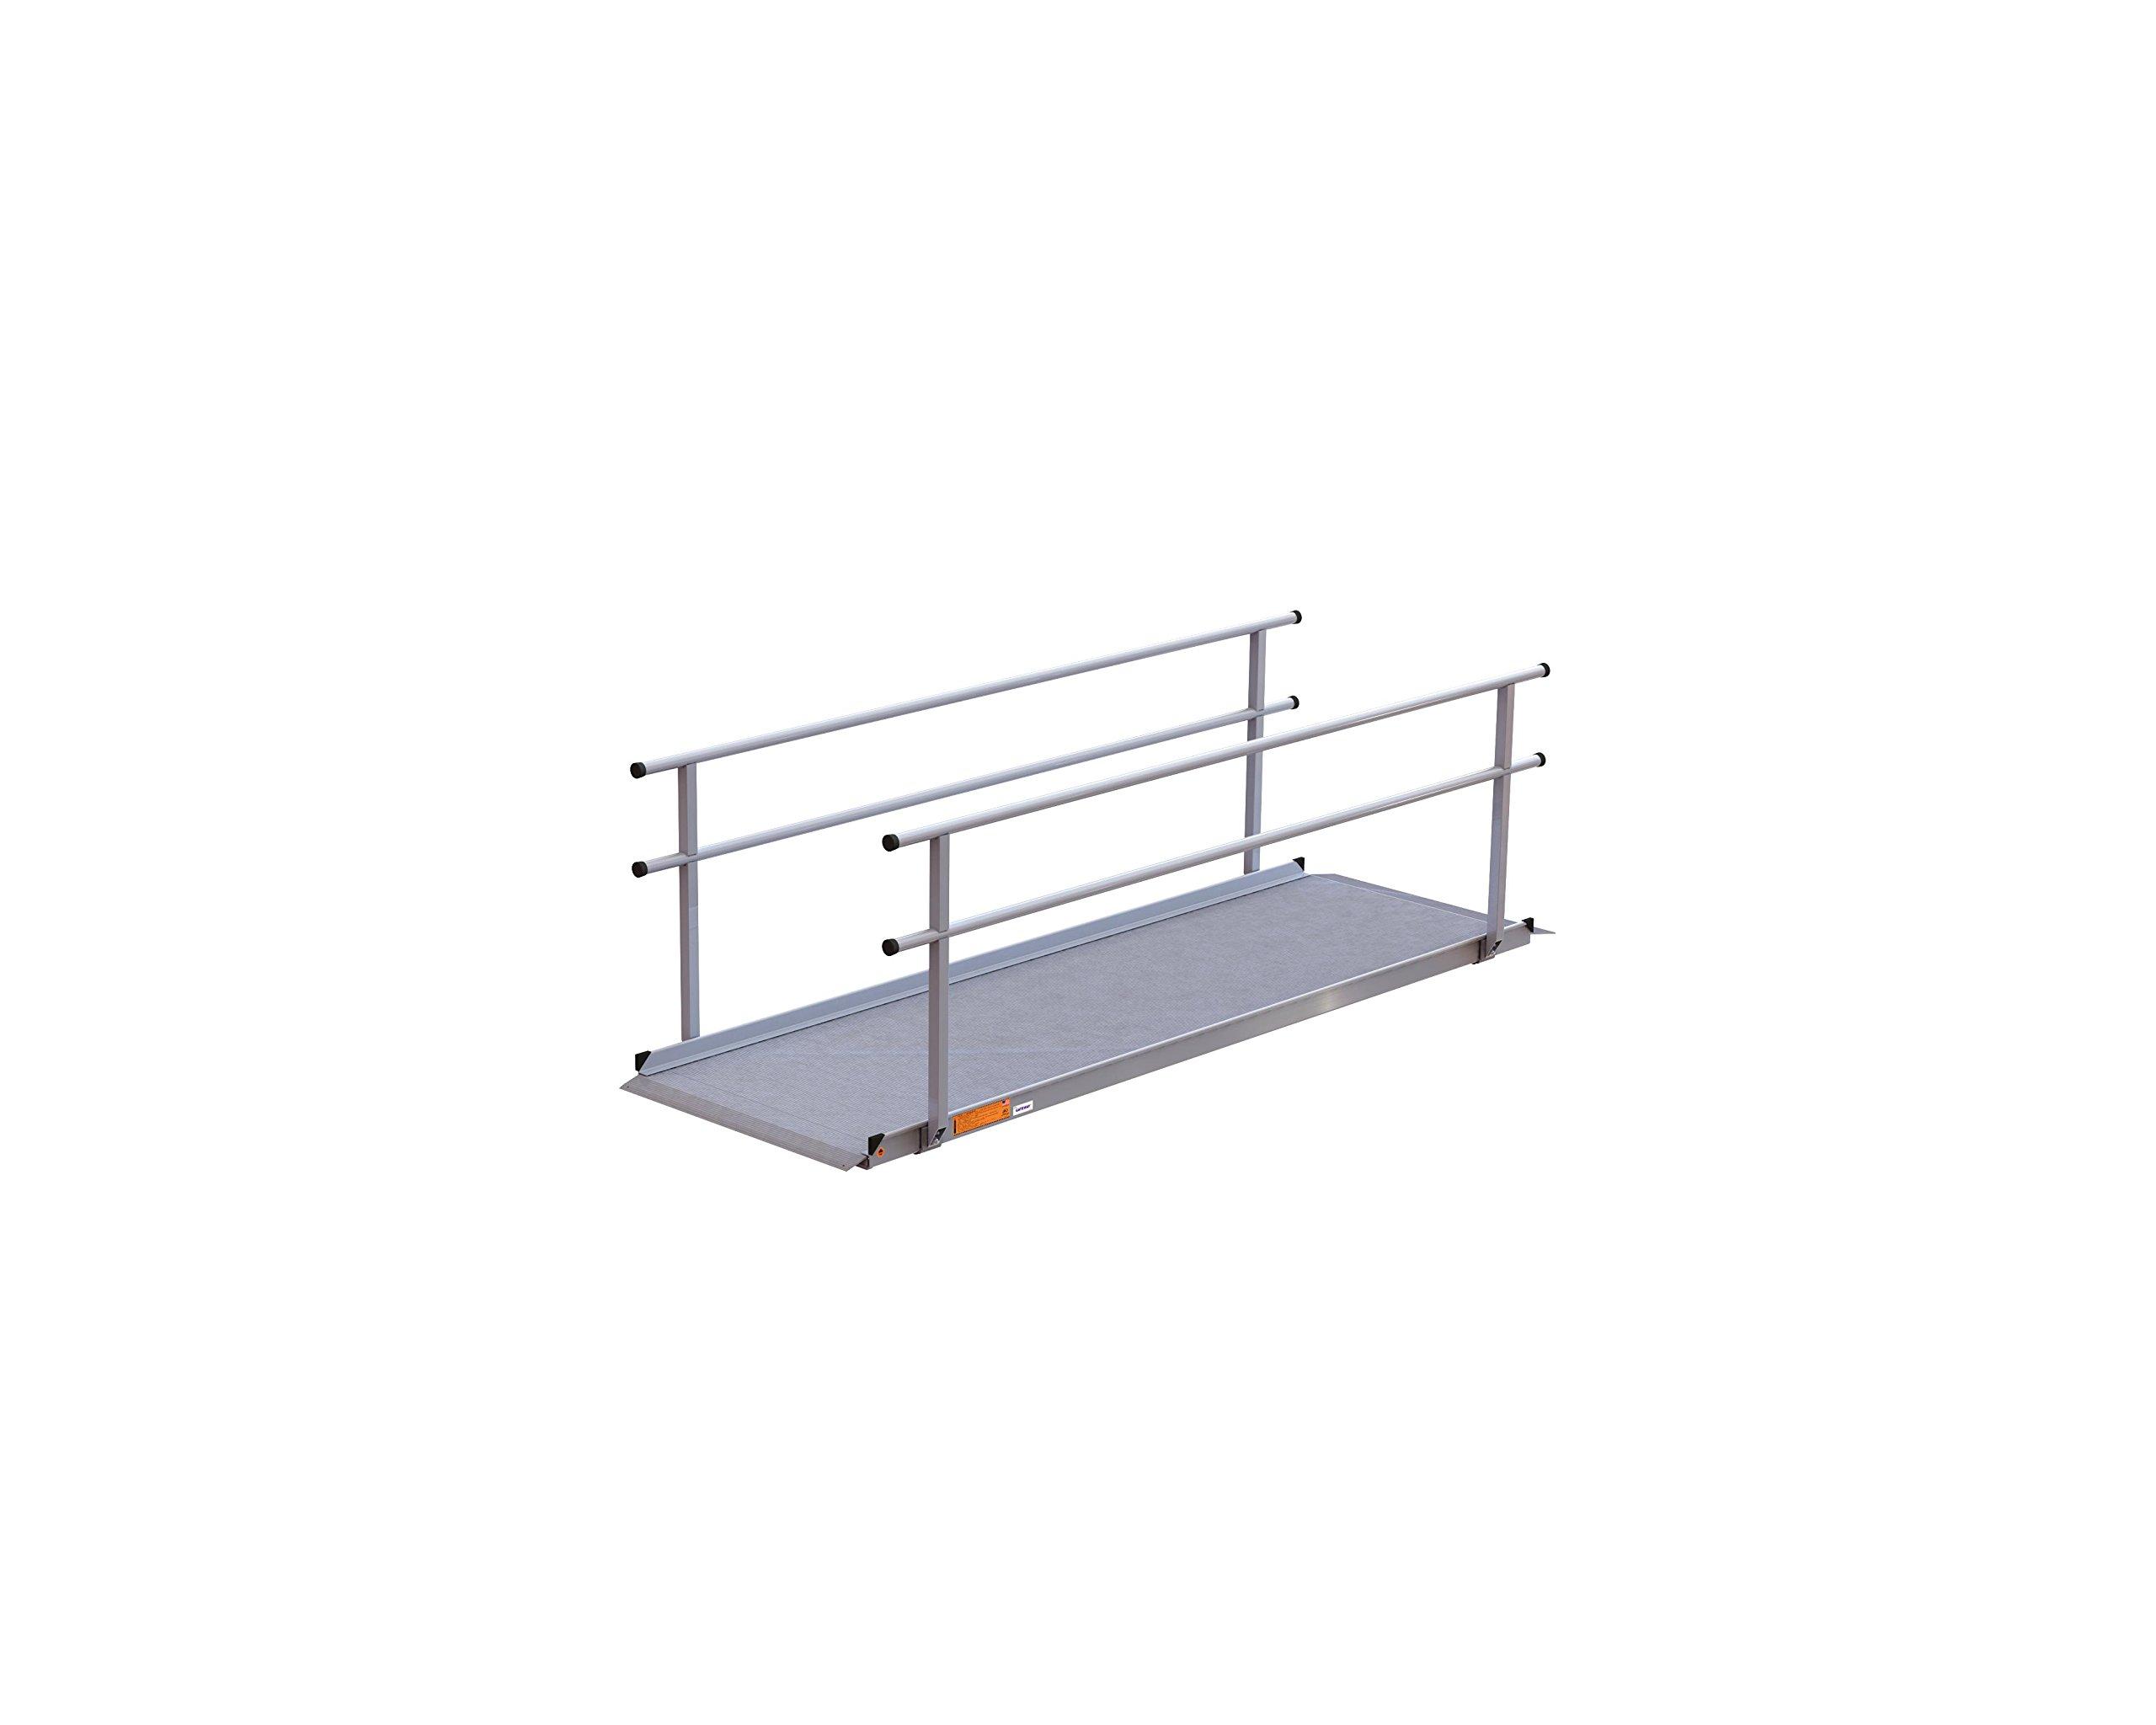 EZ-ACCESS Gateway Ramp with Handrails, 10 Feet